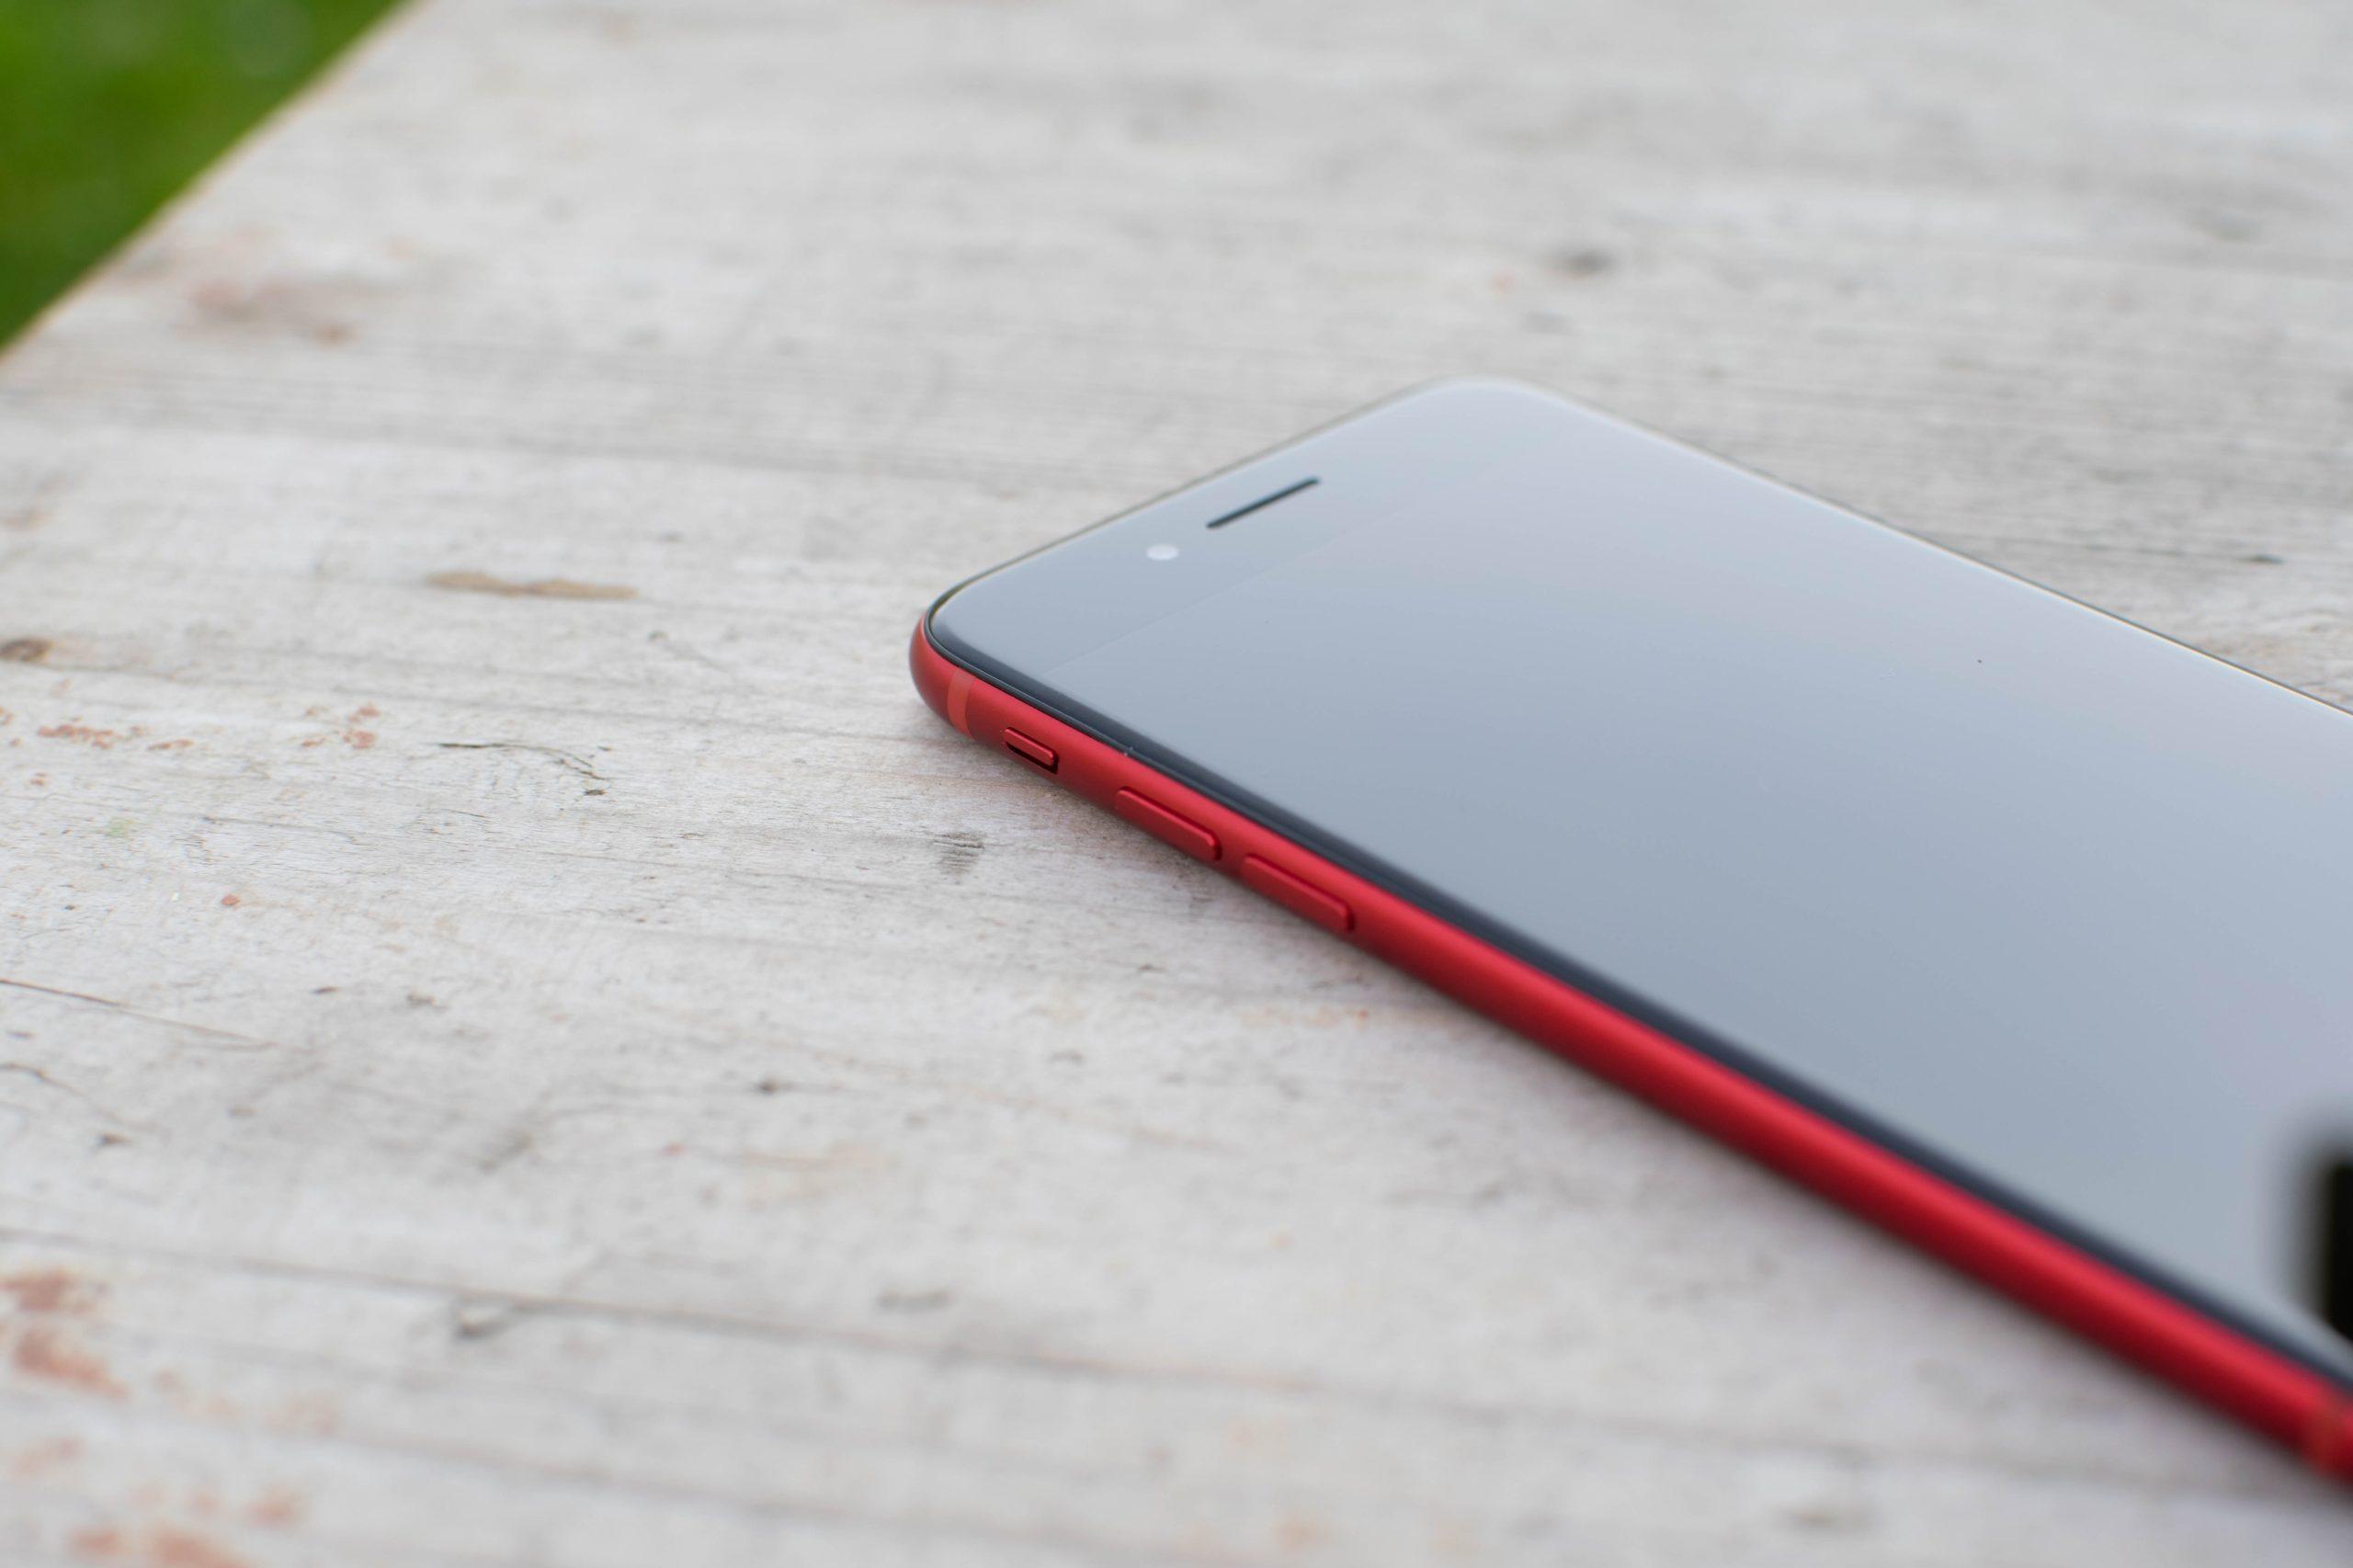 iPhone SE 2 a horní reproduktor